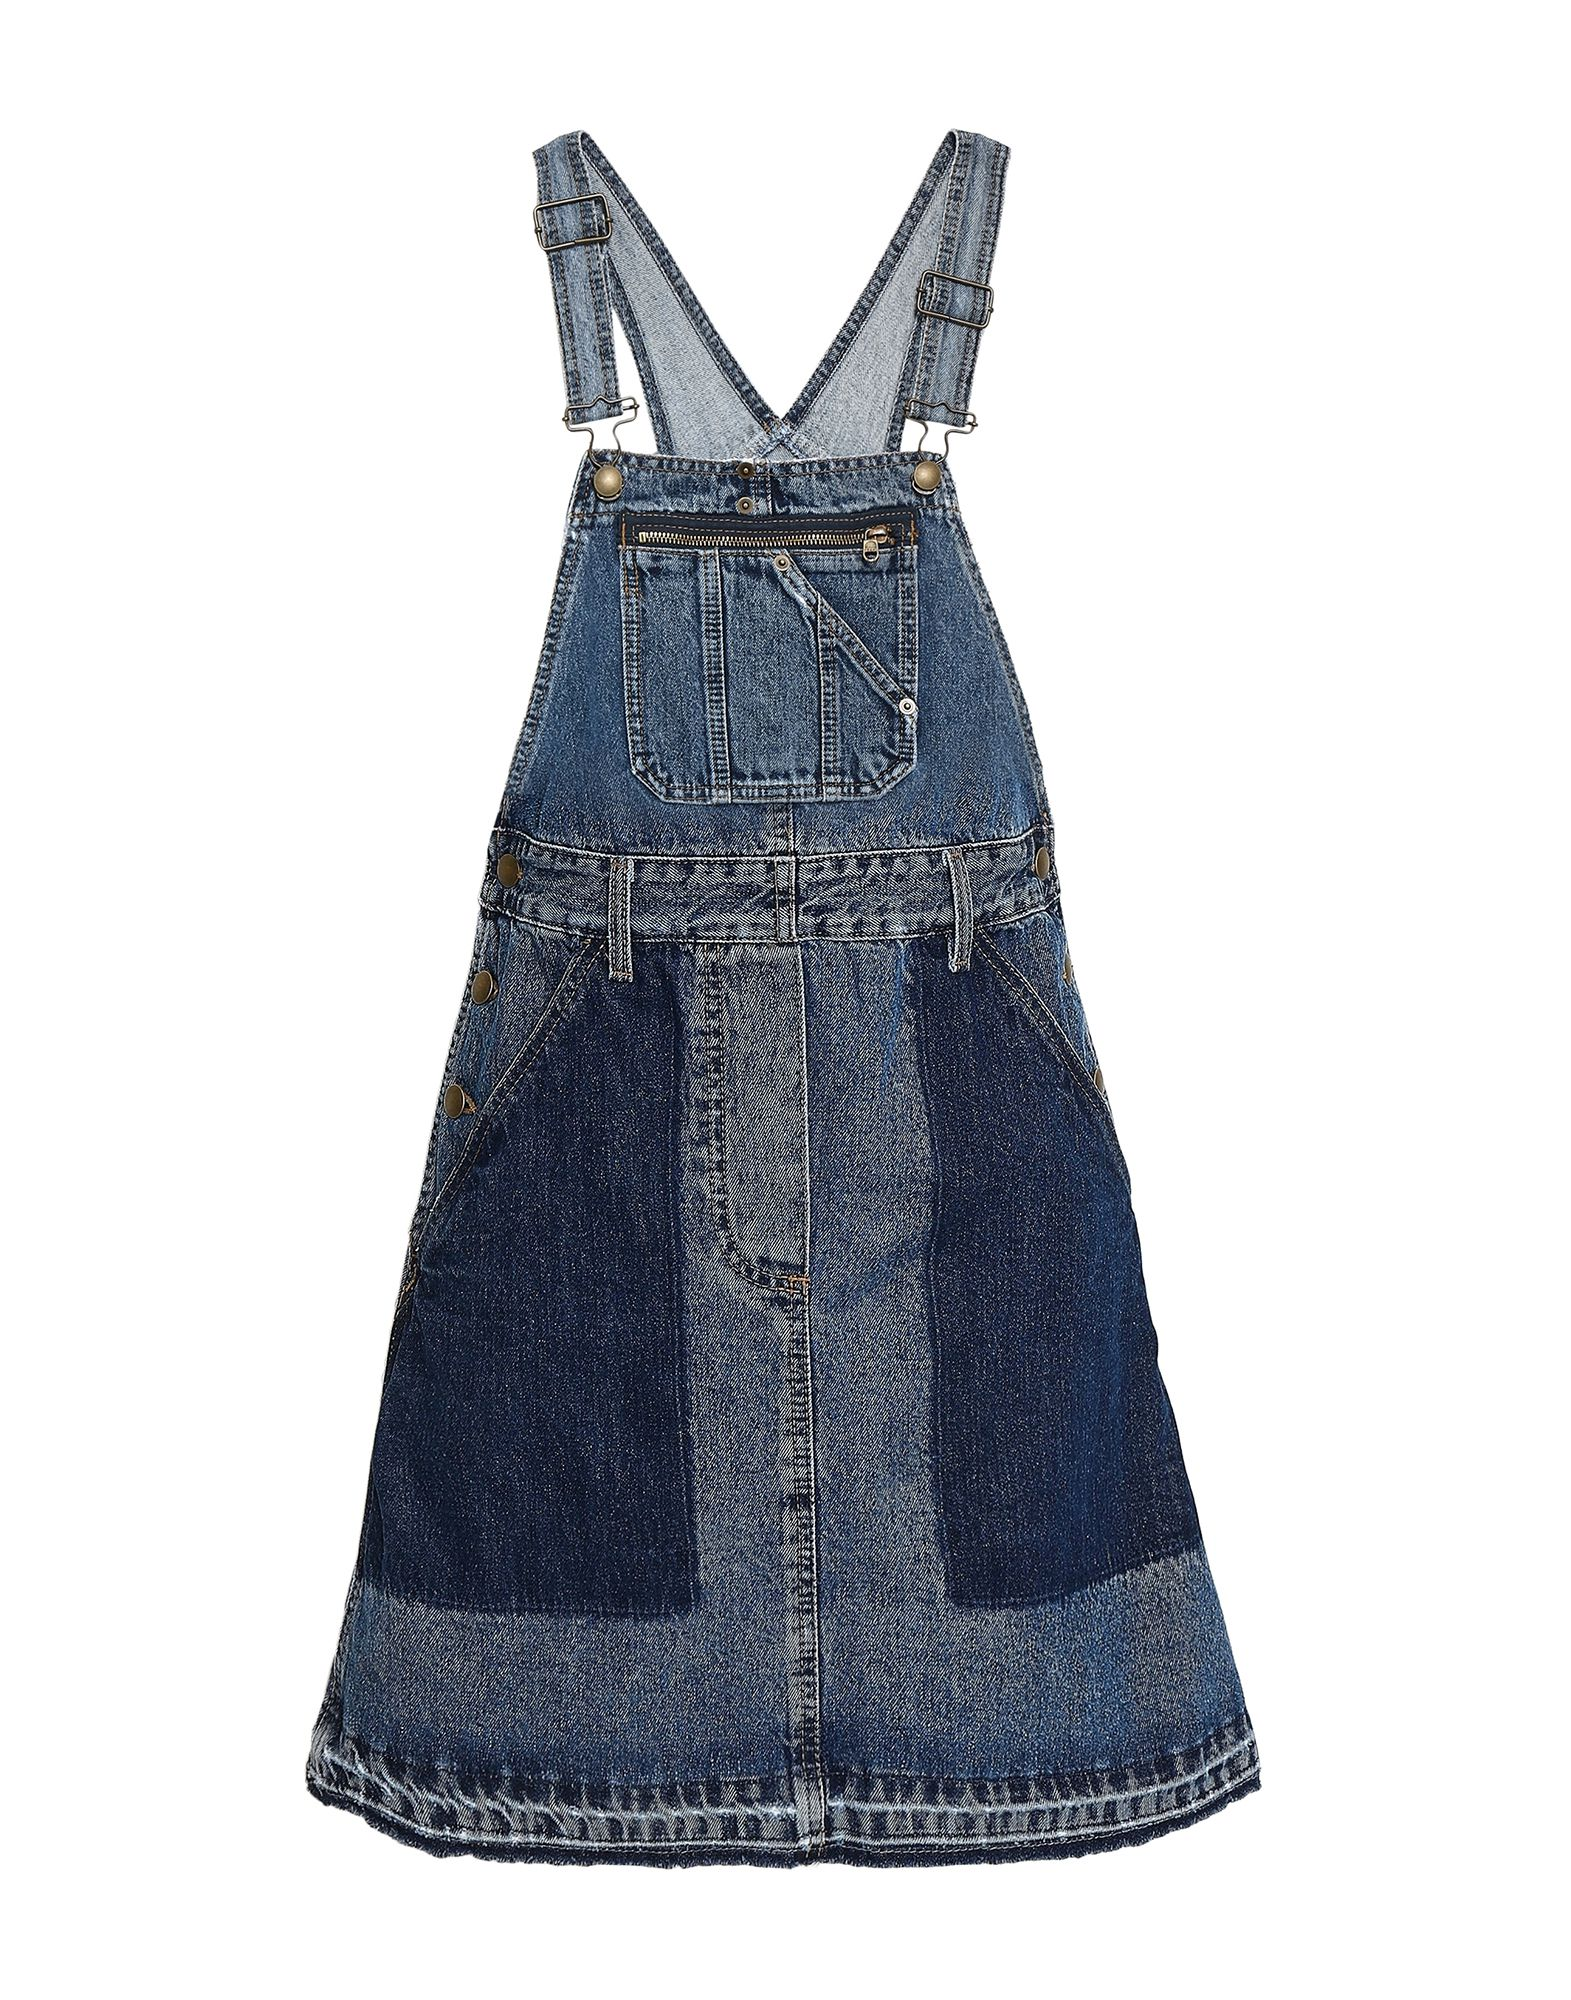 McQ Alexander McQueen Overall skirts - Item 54173268